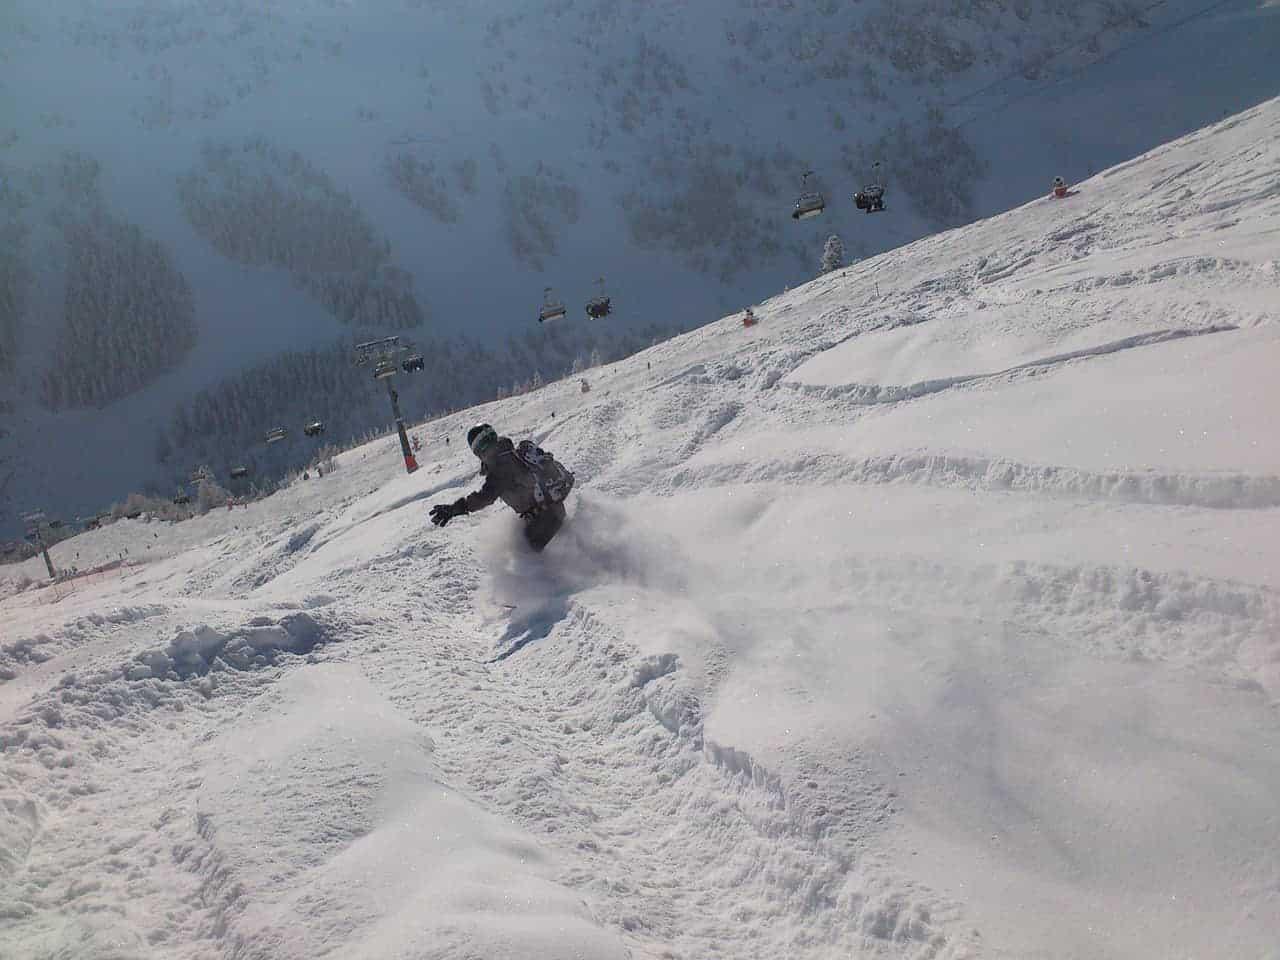 Over snowboarden